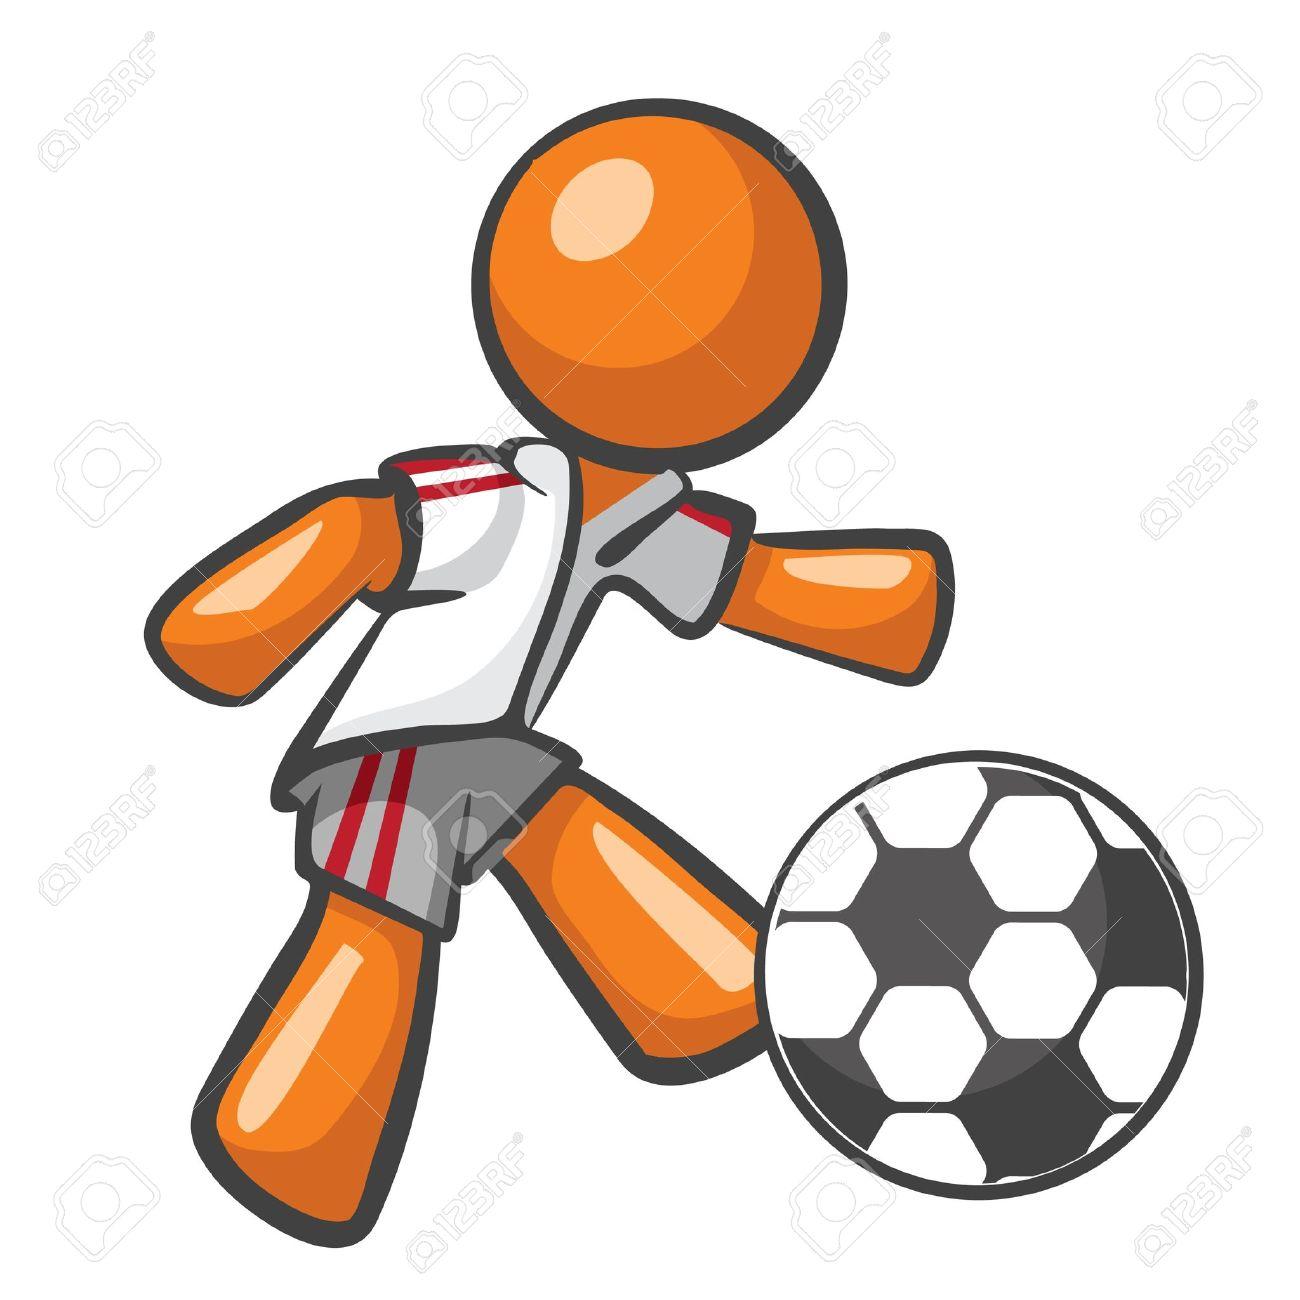 Orange Man playing soccer, kicking a soccer ball. Stock Vector - 12803739